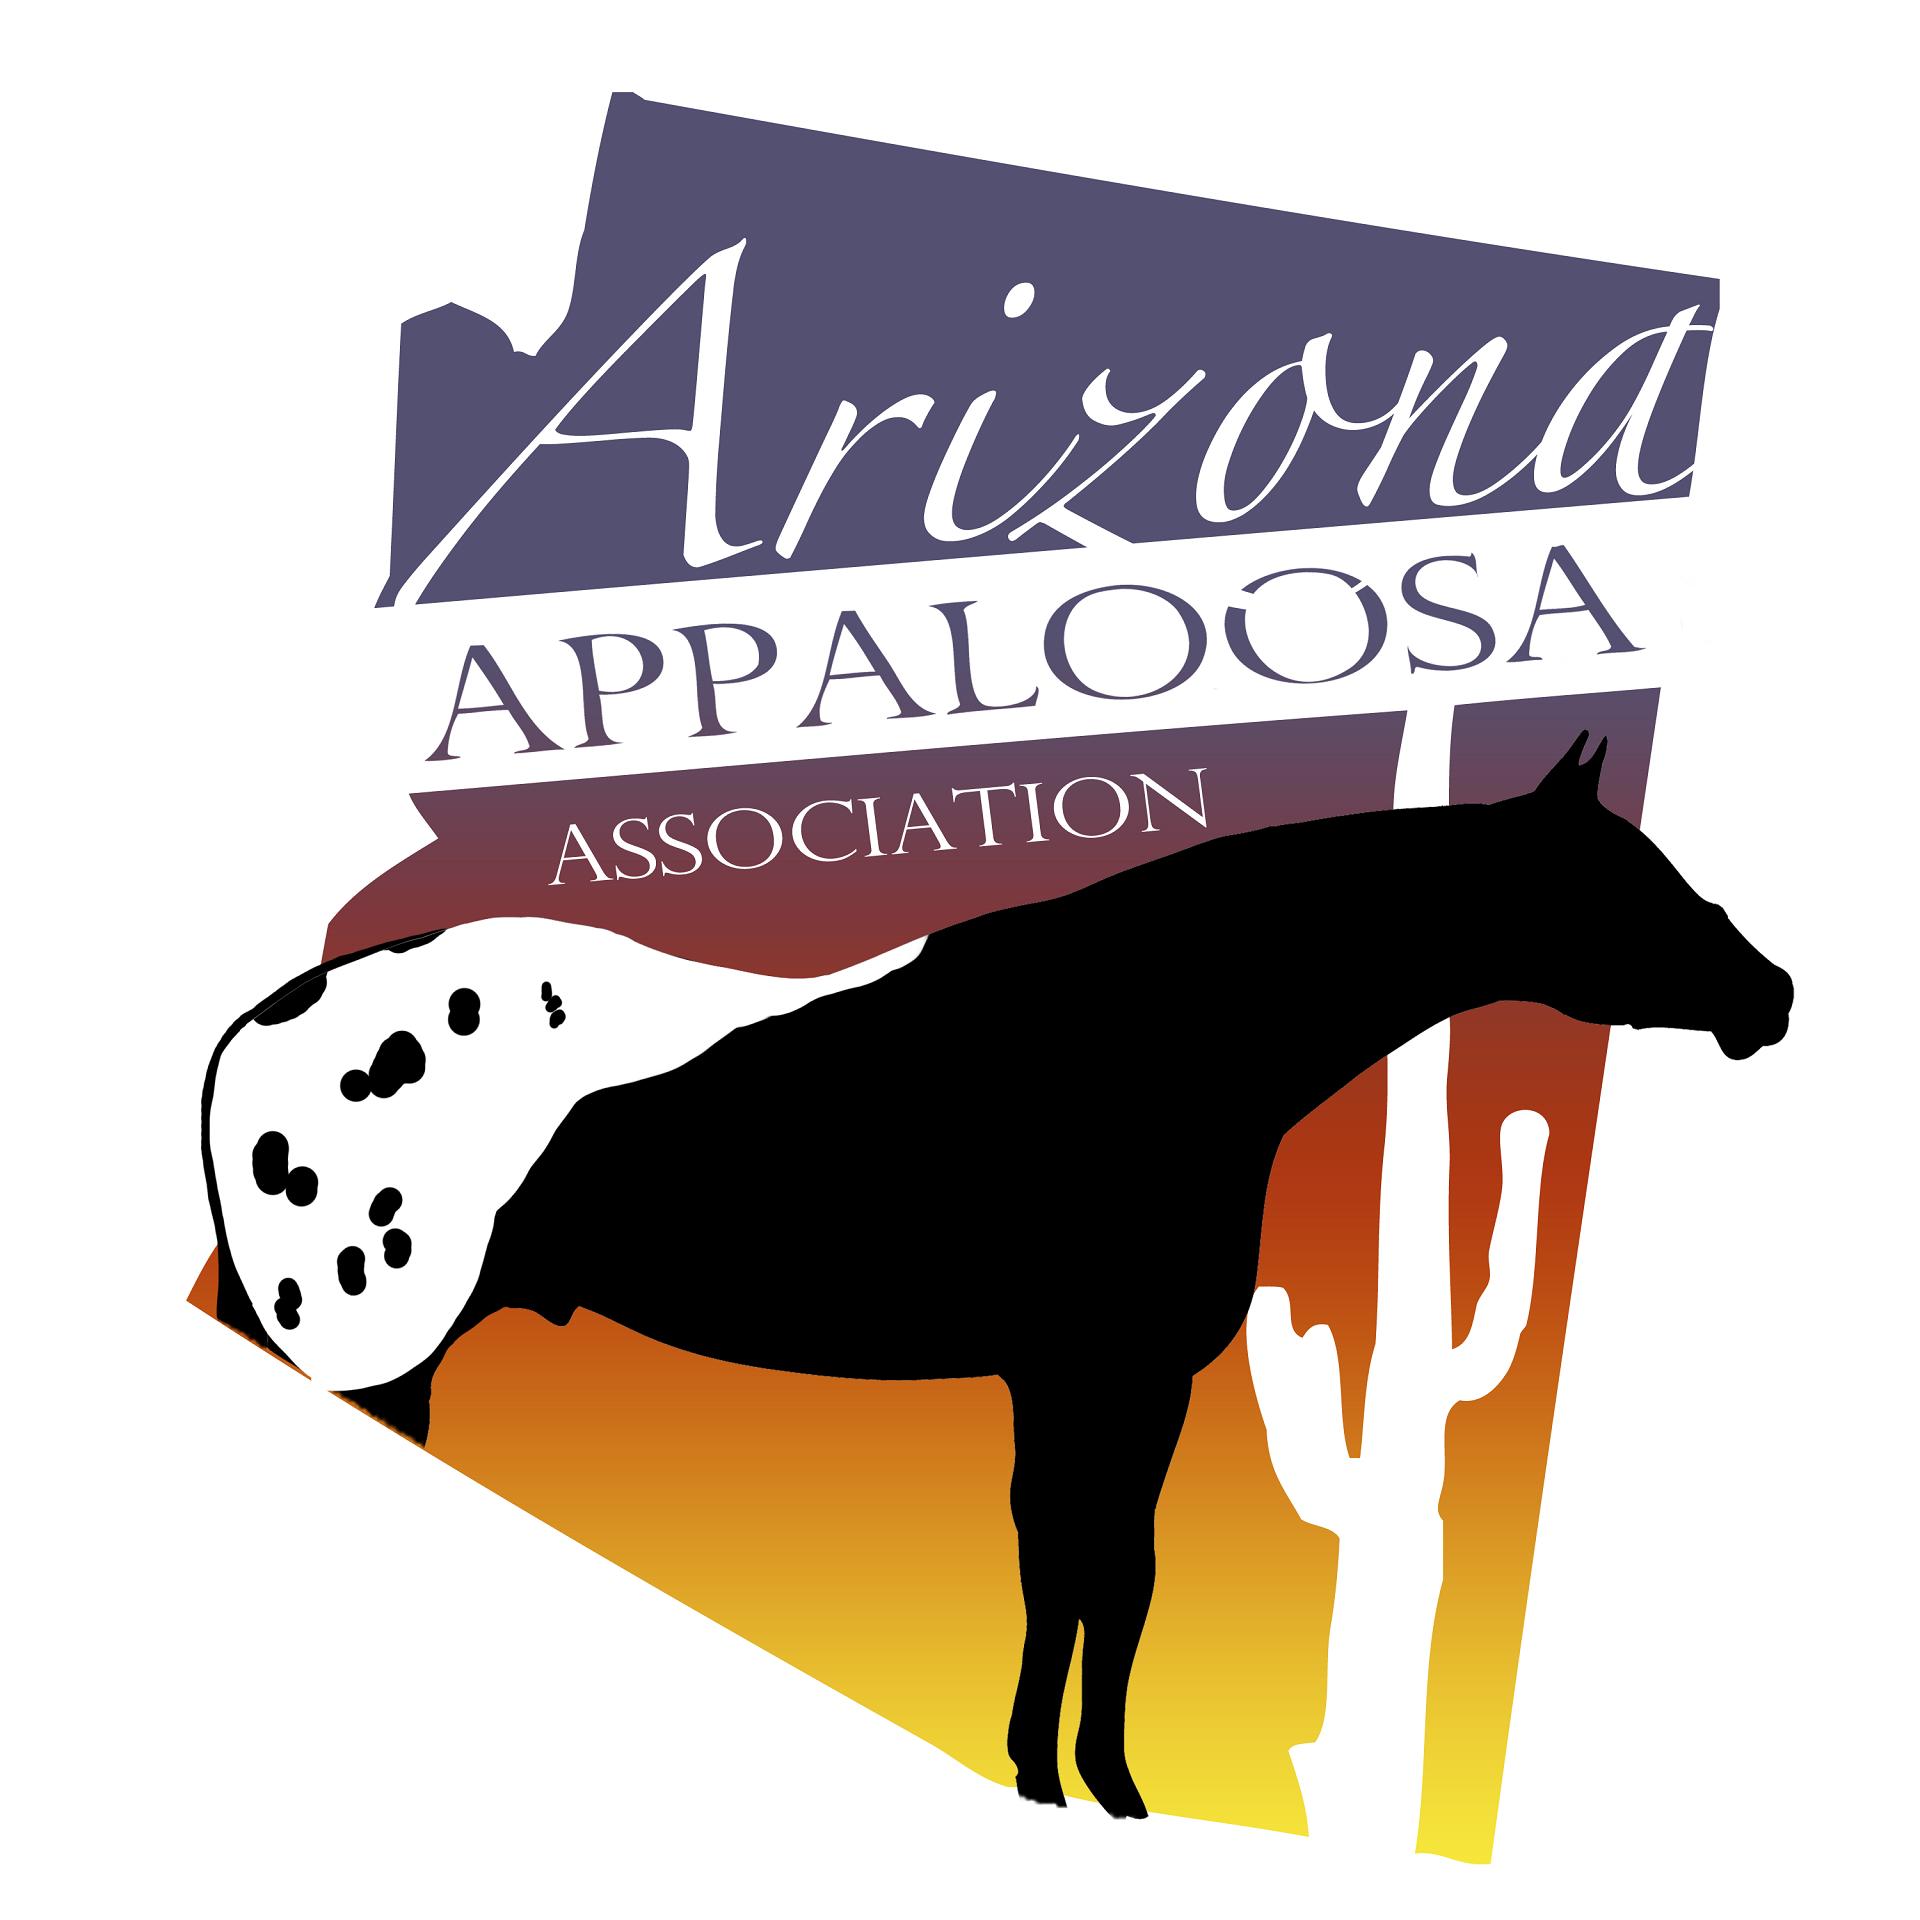 Appaloosa Horse Club Logo Png - Appaloosa Horse Club Logo Png Hdpng.com 1920, Transparent background PNG HD thumbnail